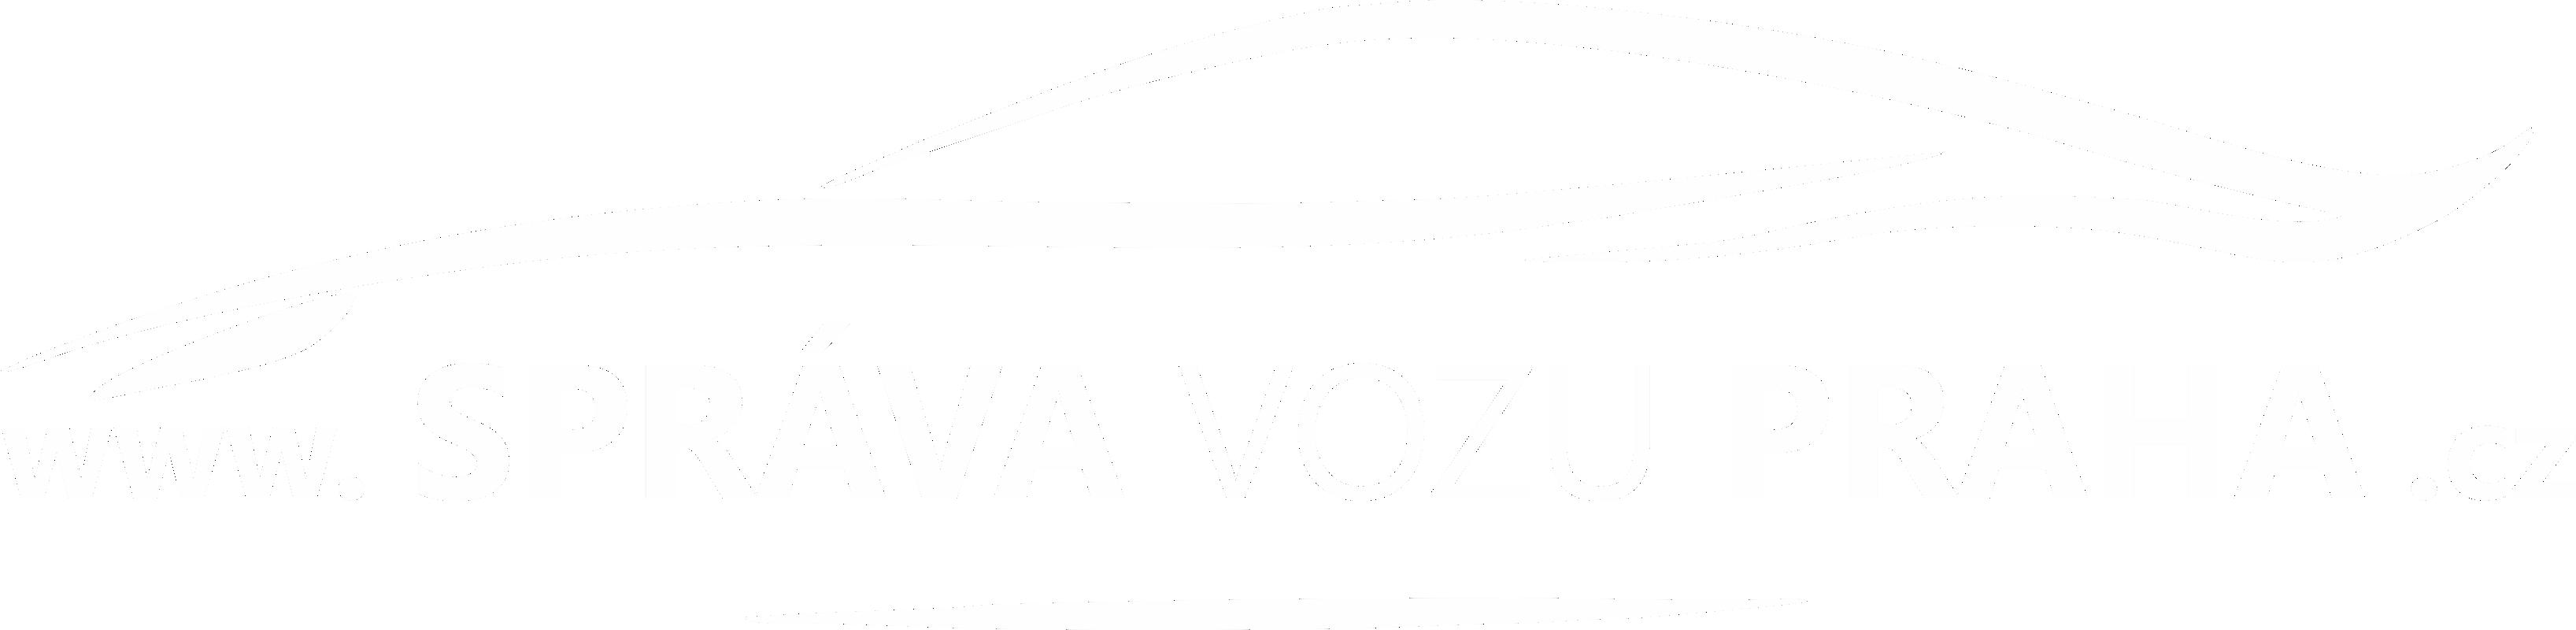 Sprava Vozu Praha